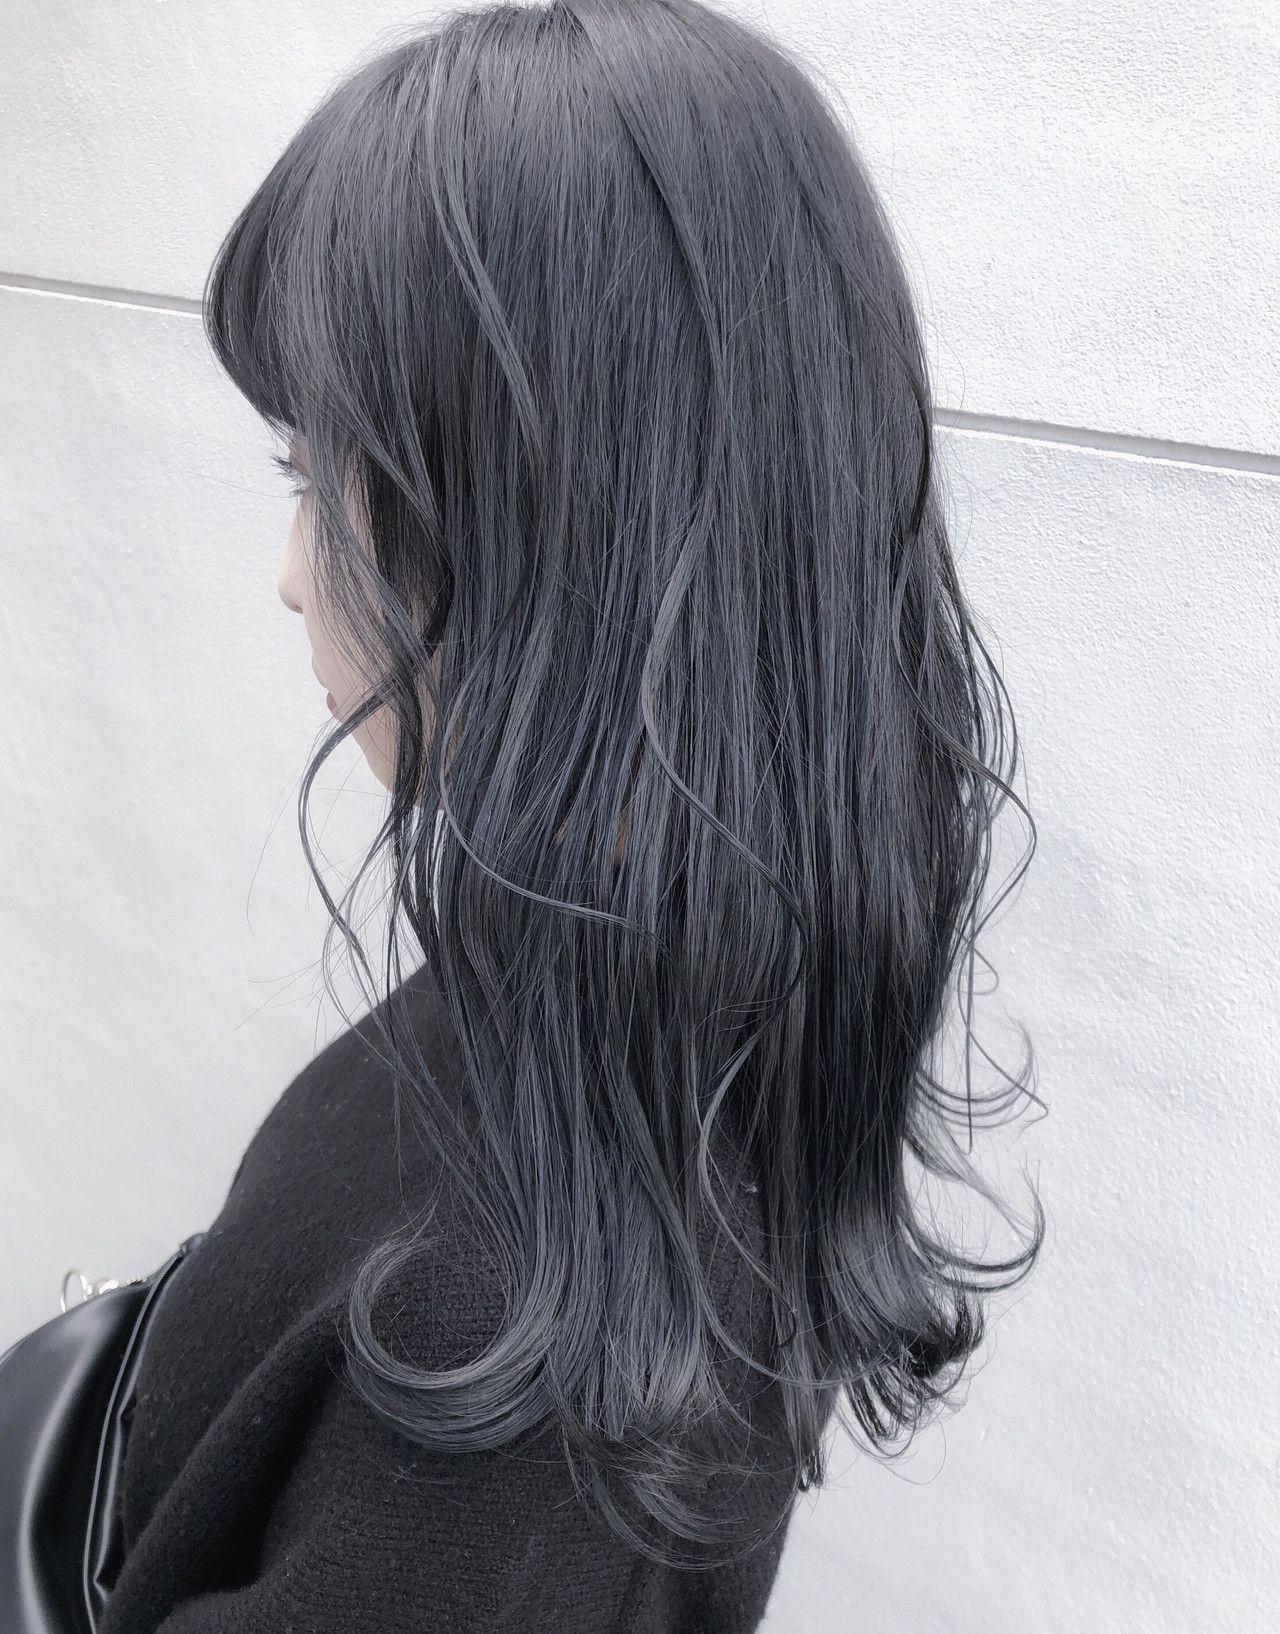 2019ss 人気暗髪ヘアカラー Hair Book Hair 髪 カラー 髪色